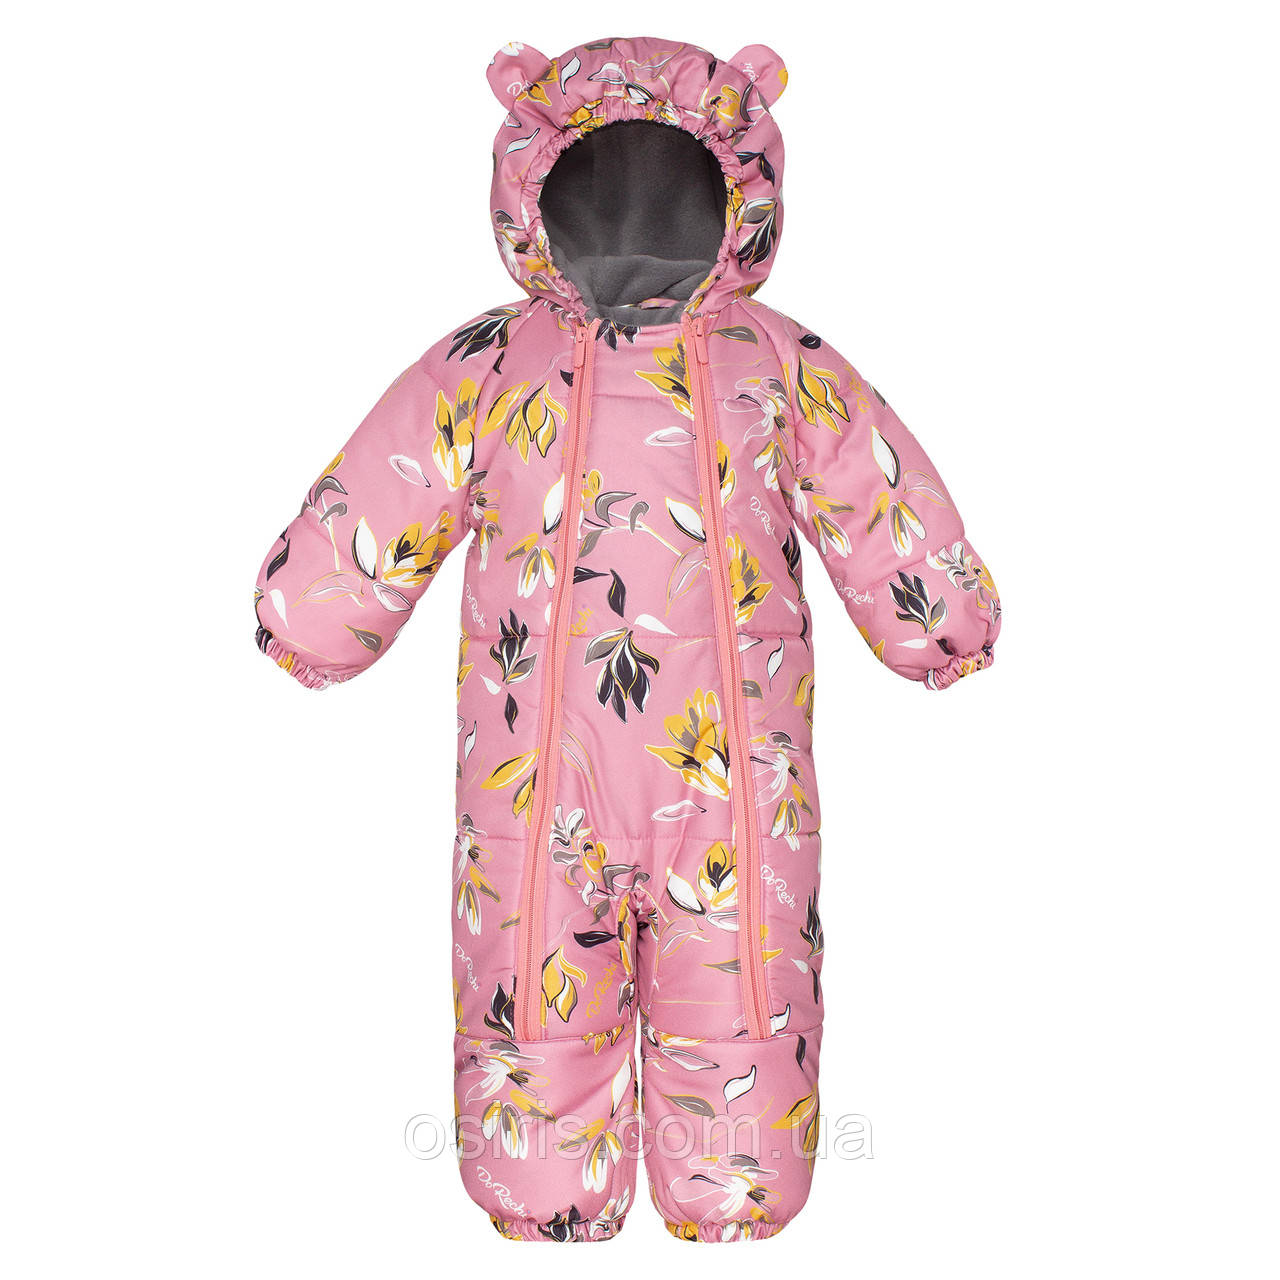 Комбинезон зимний детский Discovery Розовая Мечта / Детские зимние комбинезоны